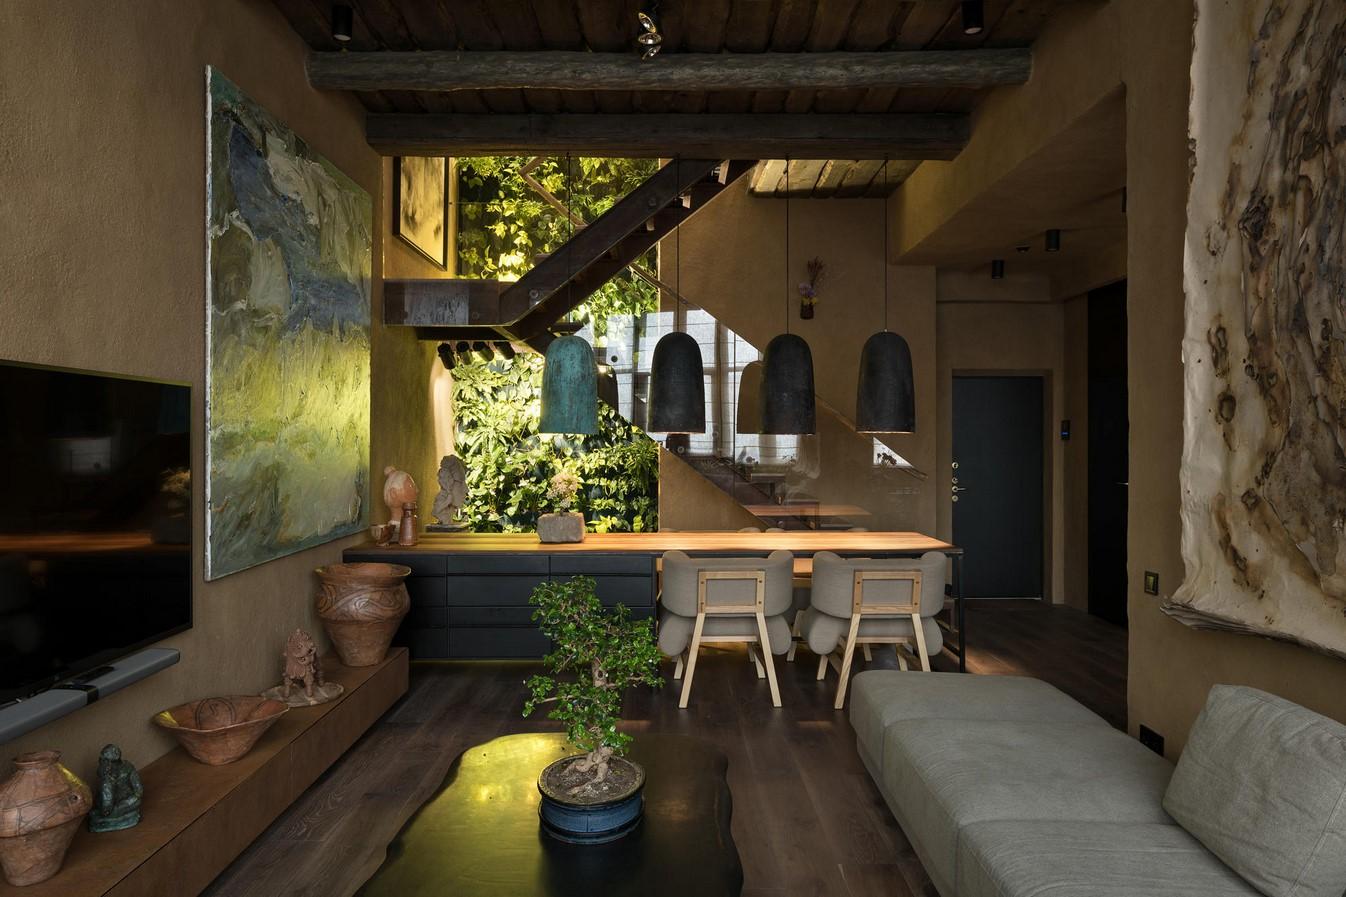 Wabi Sabi Apartment by Sergey Makhno in Kiev: Perfectly Imperfect - Sheet4